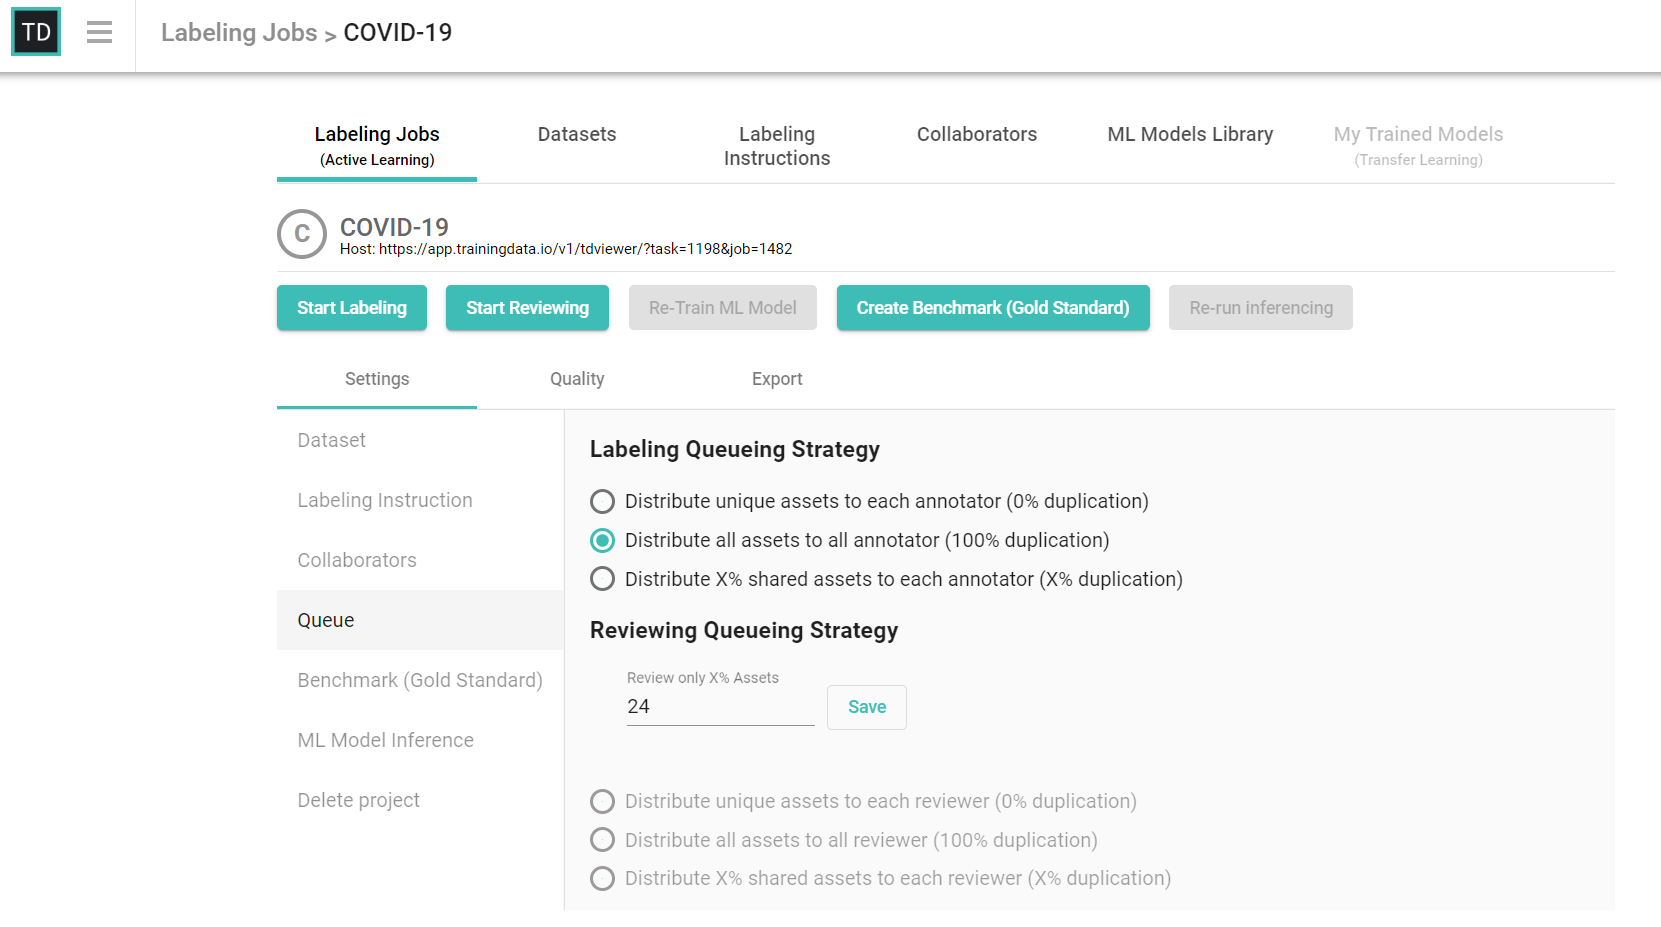 TrainingData.io Labeling Jobs Active Learning UI Screenshot